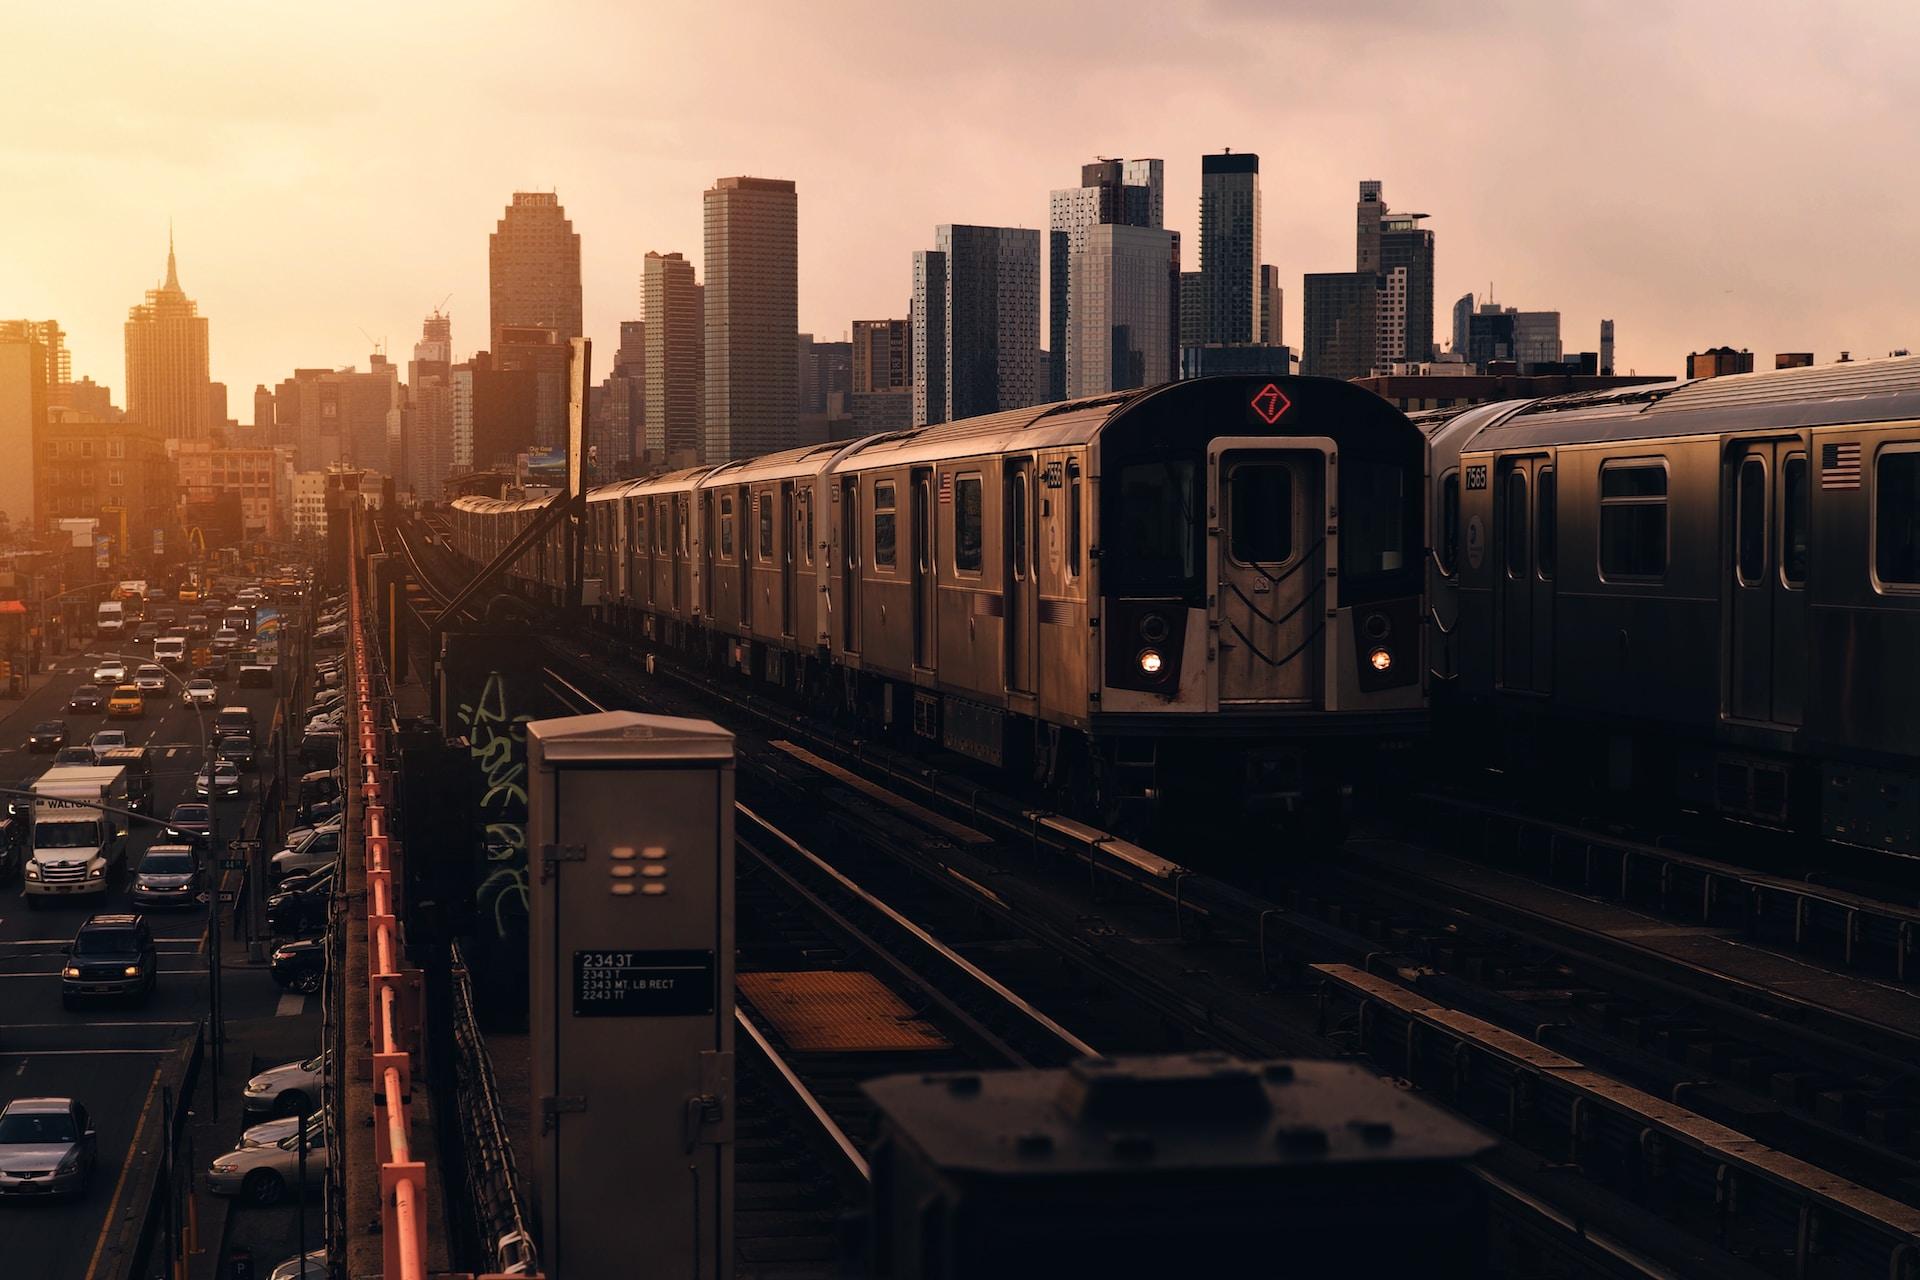 train approaching near high-rise buildings